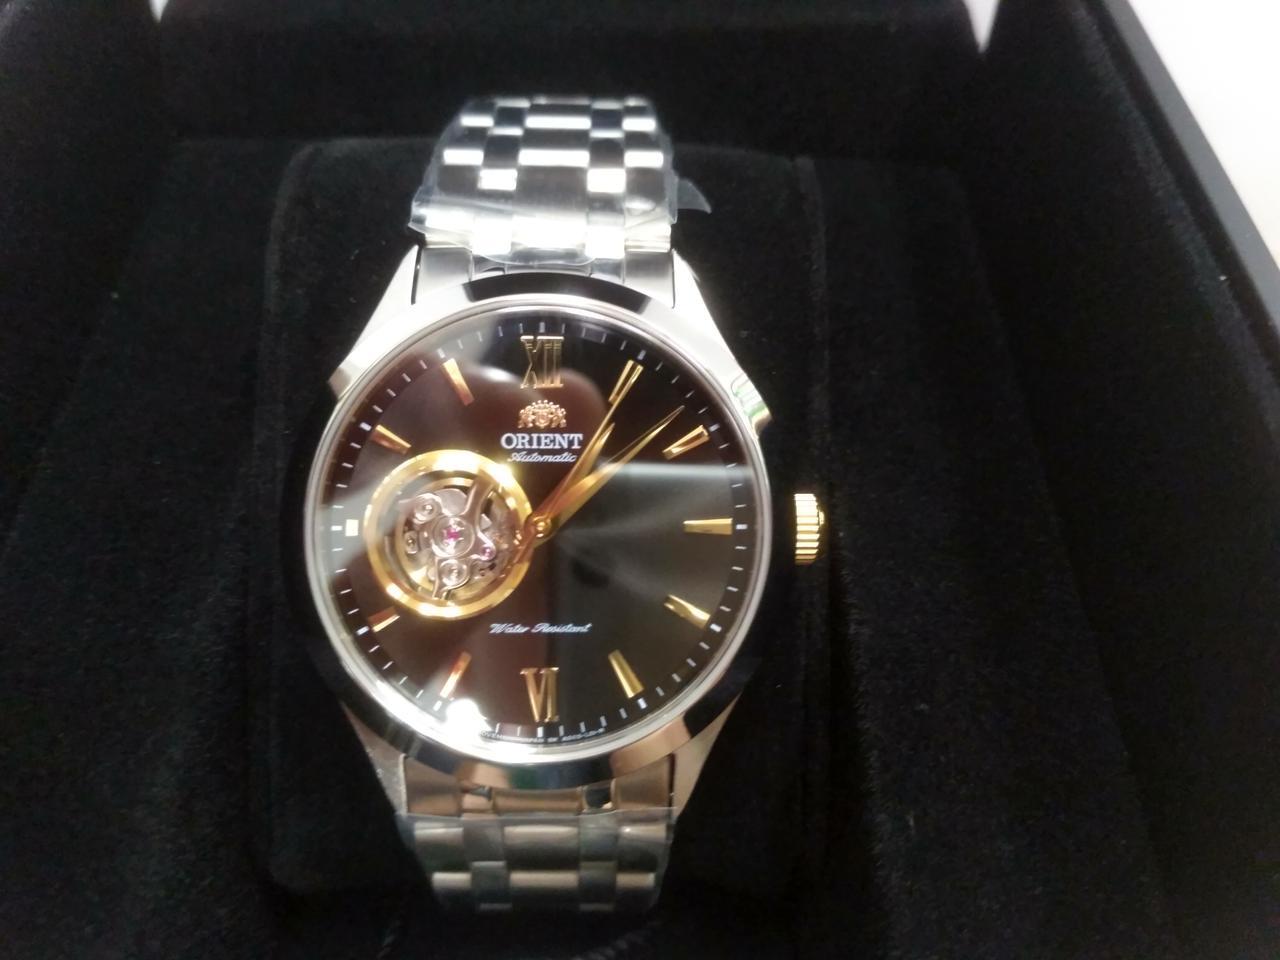 Часы ORIENT FAG03002B0   ОРИЕНТ   Японские наручные часы   Украина    Одесса e1b1d8fdc6f5e